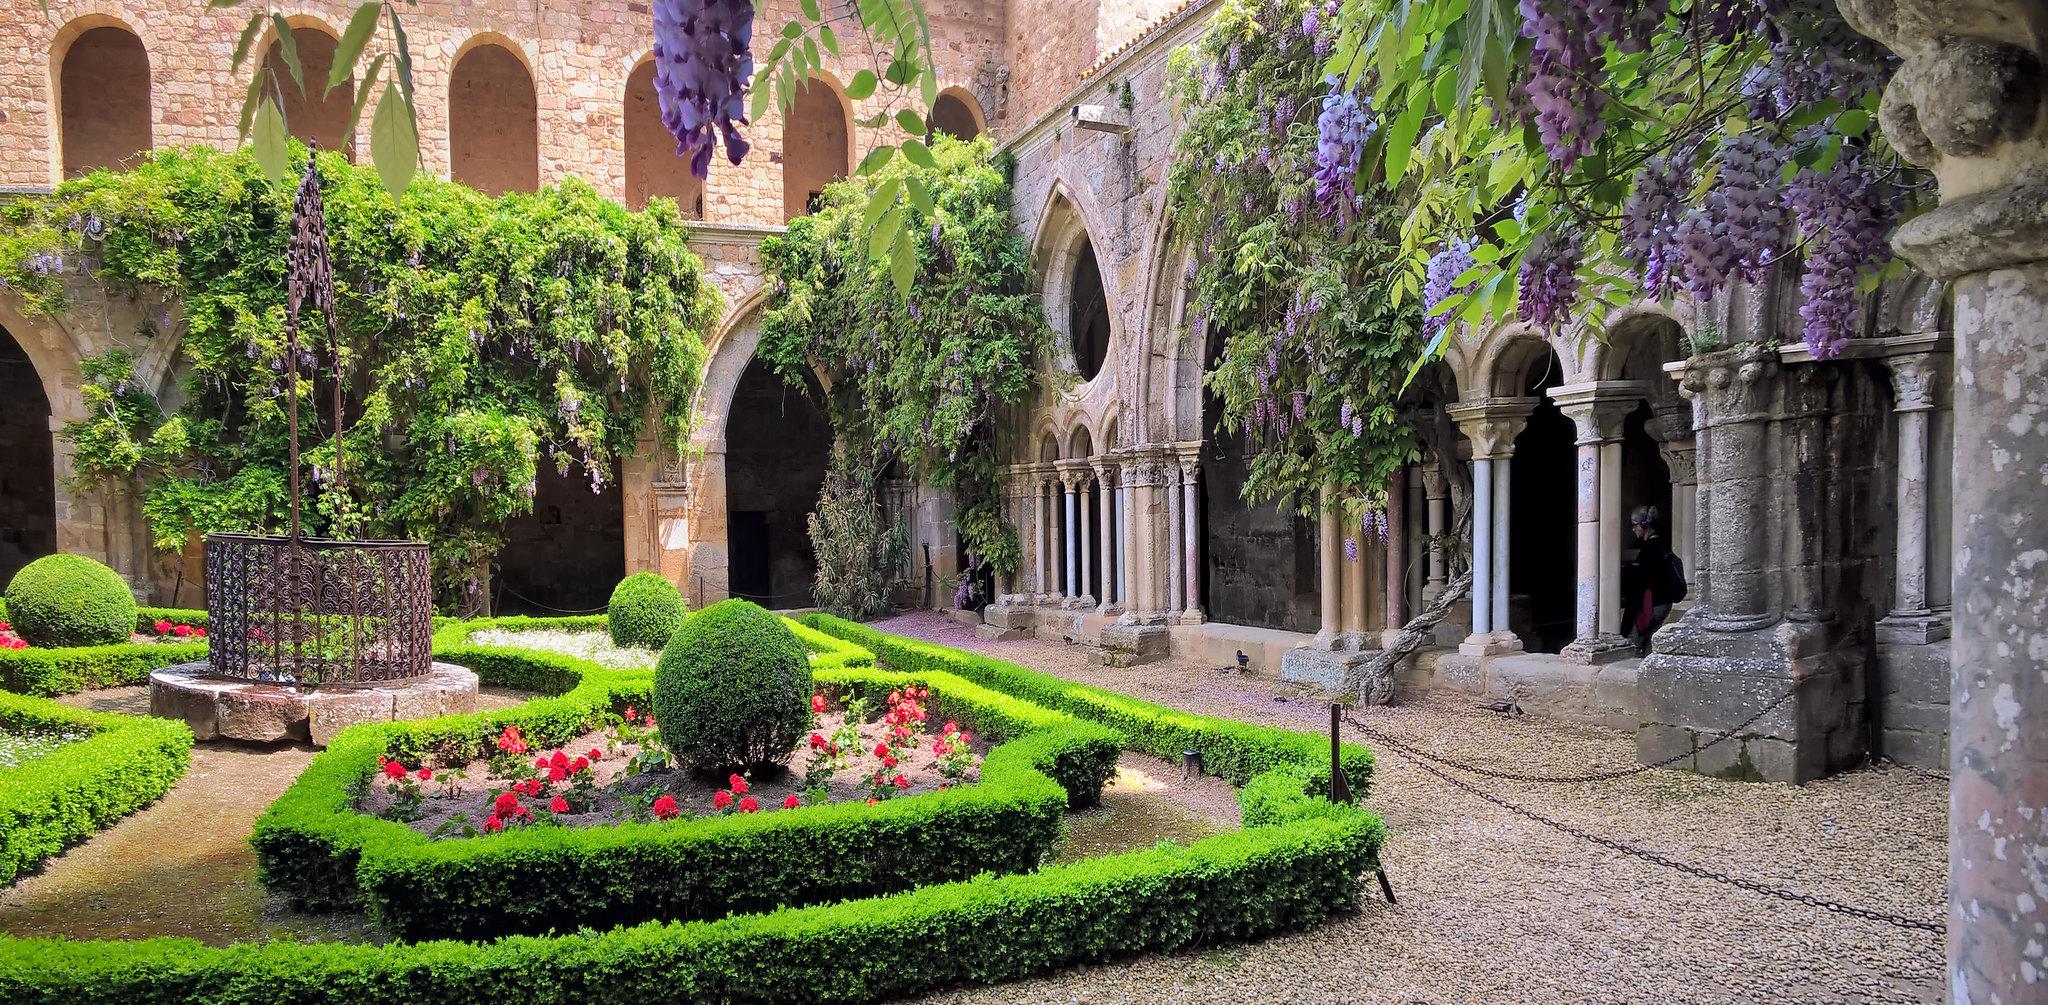 Abbaye de Fontfroide, France